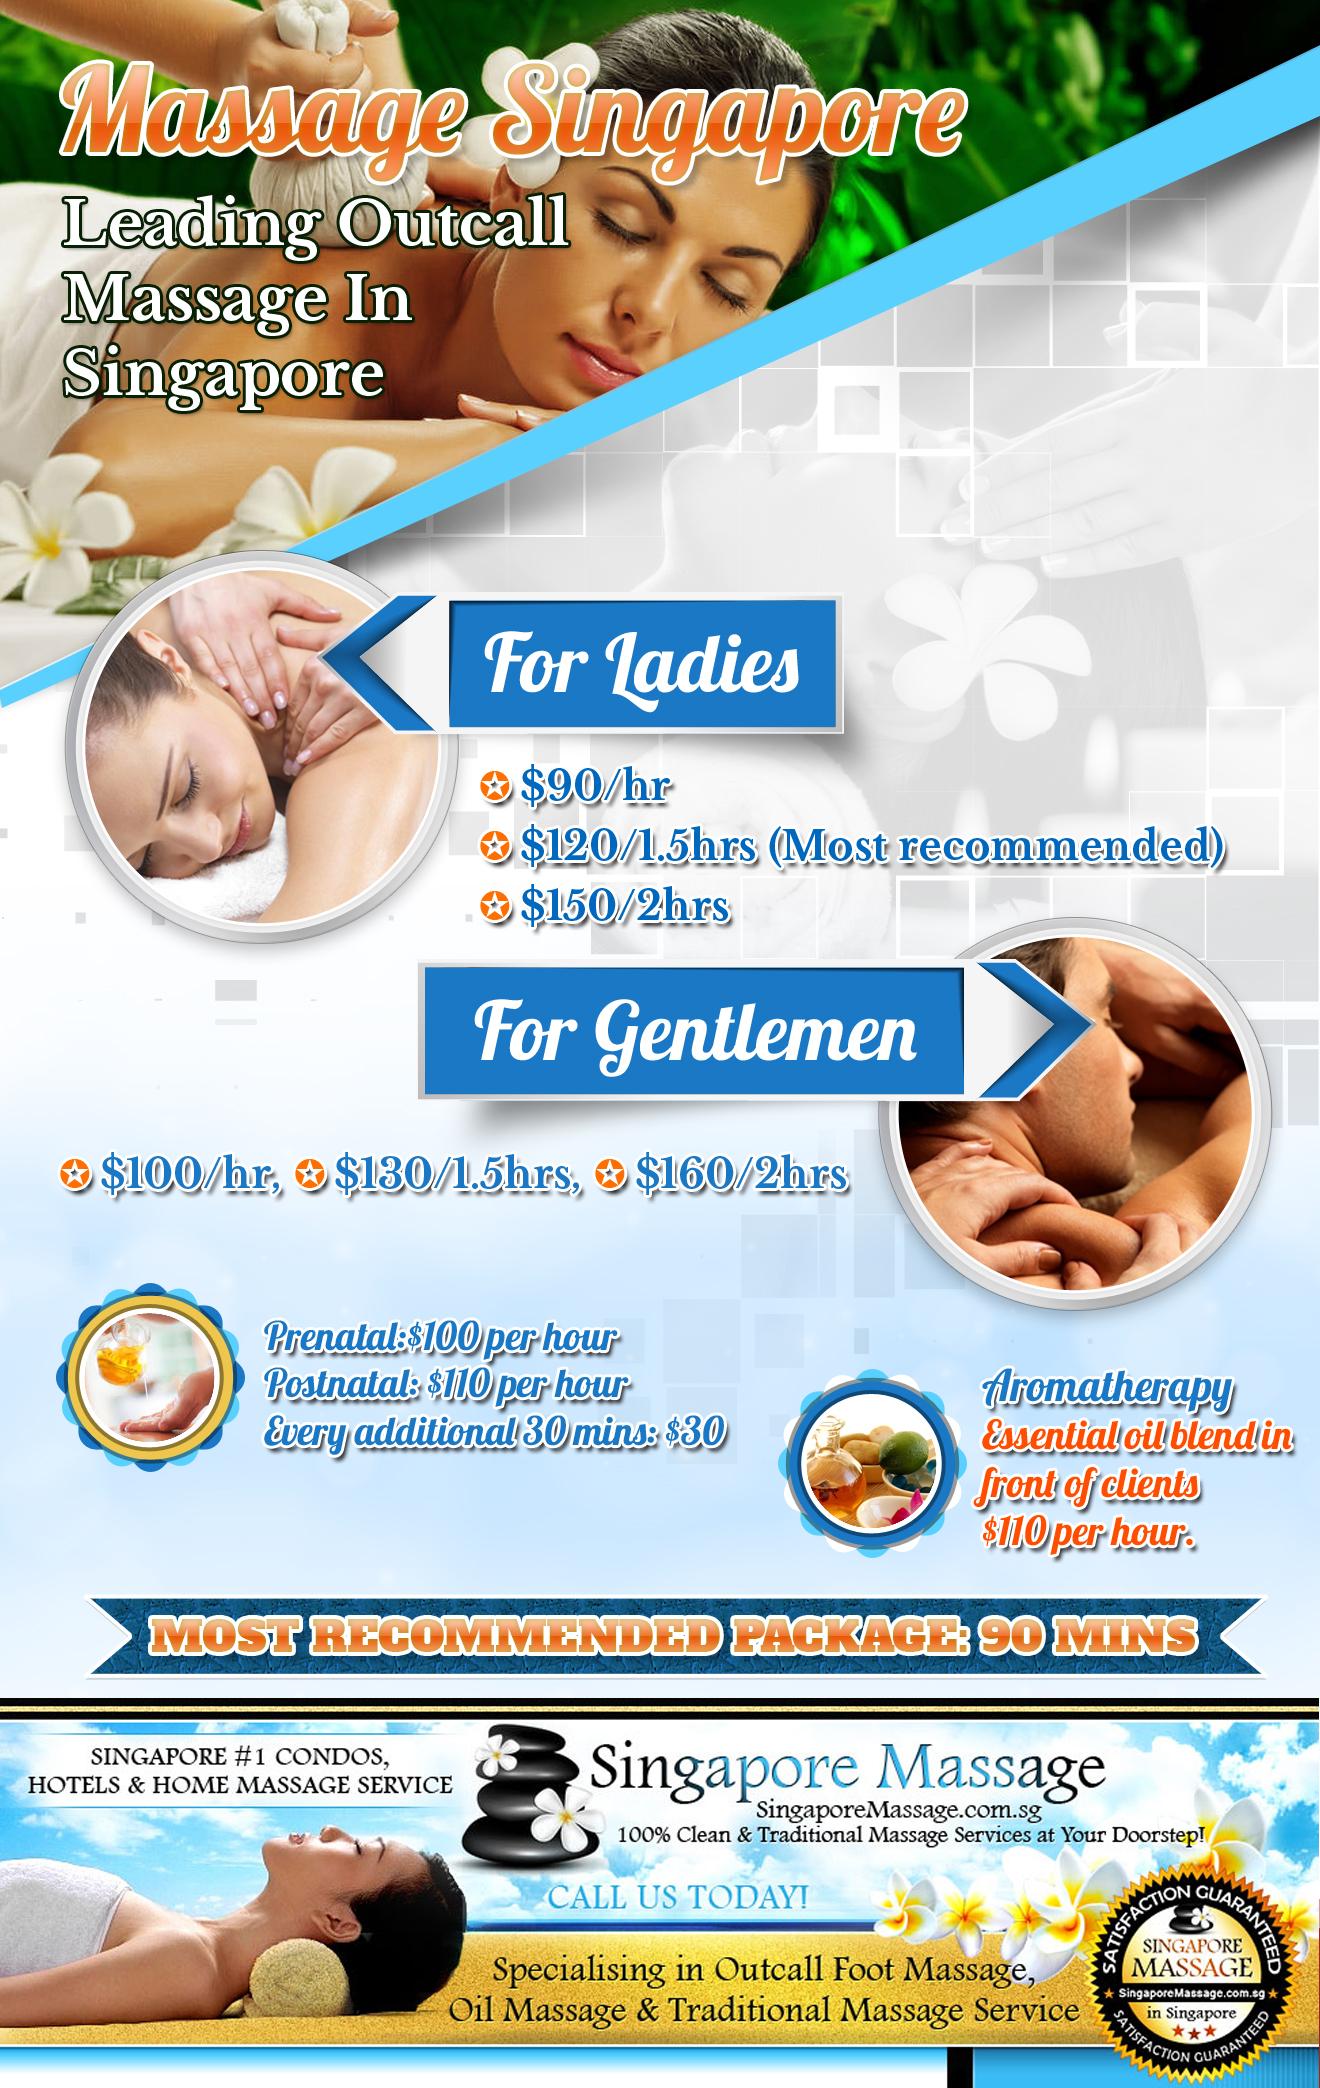 Massage Singapore - Outcall Massage Pricelist